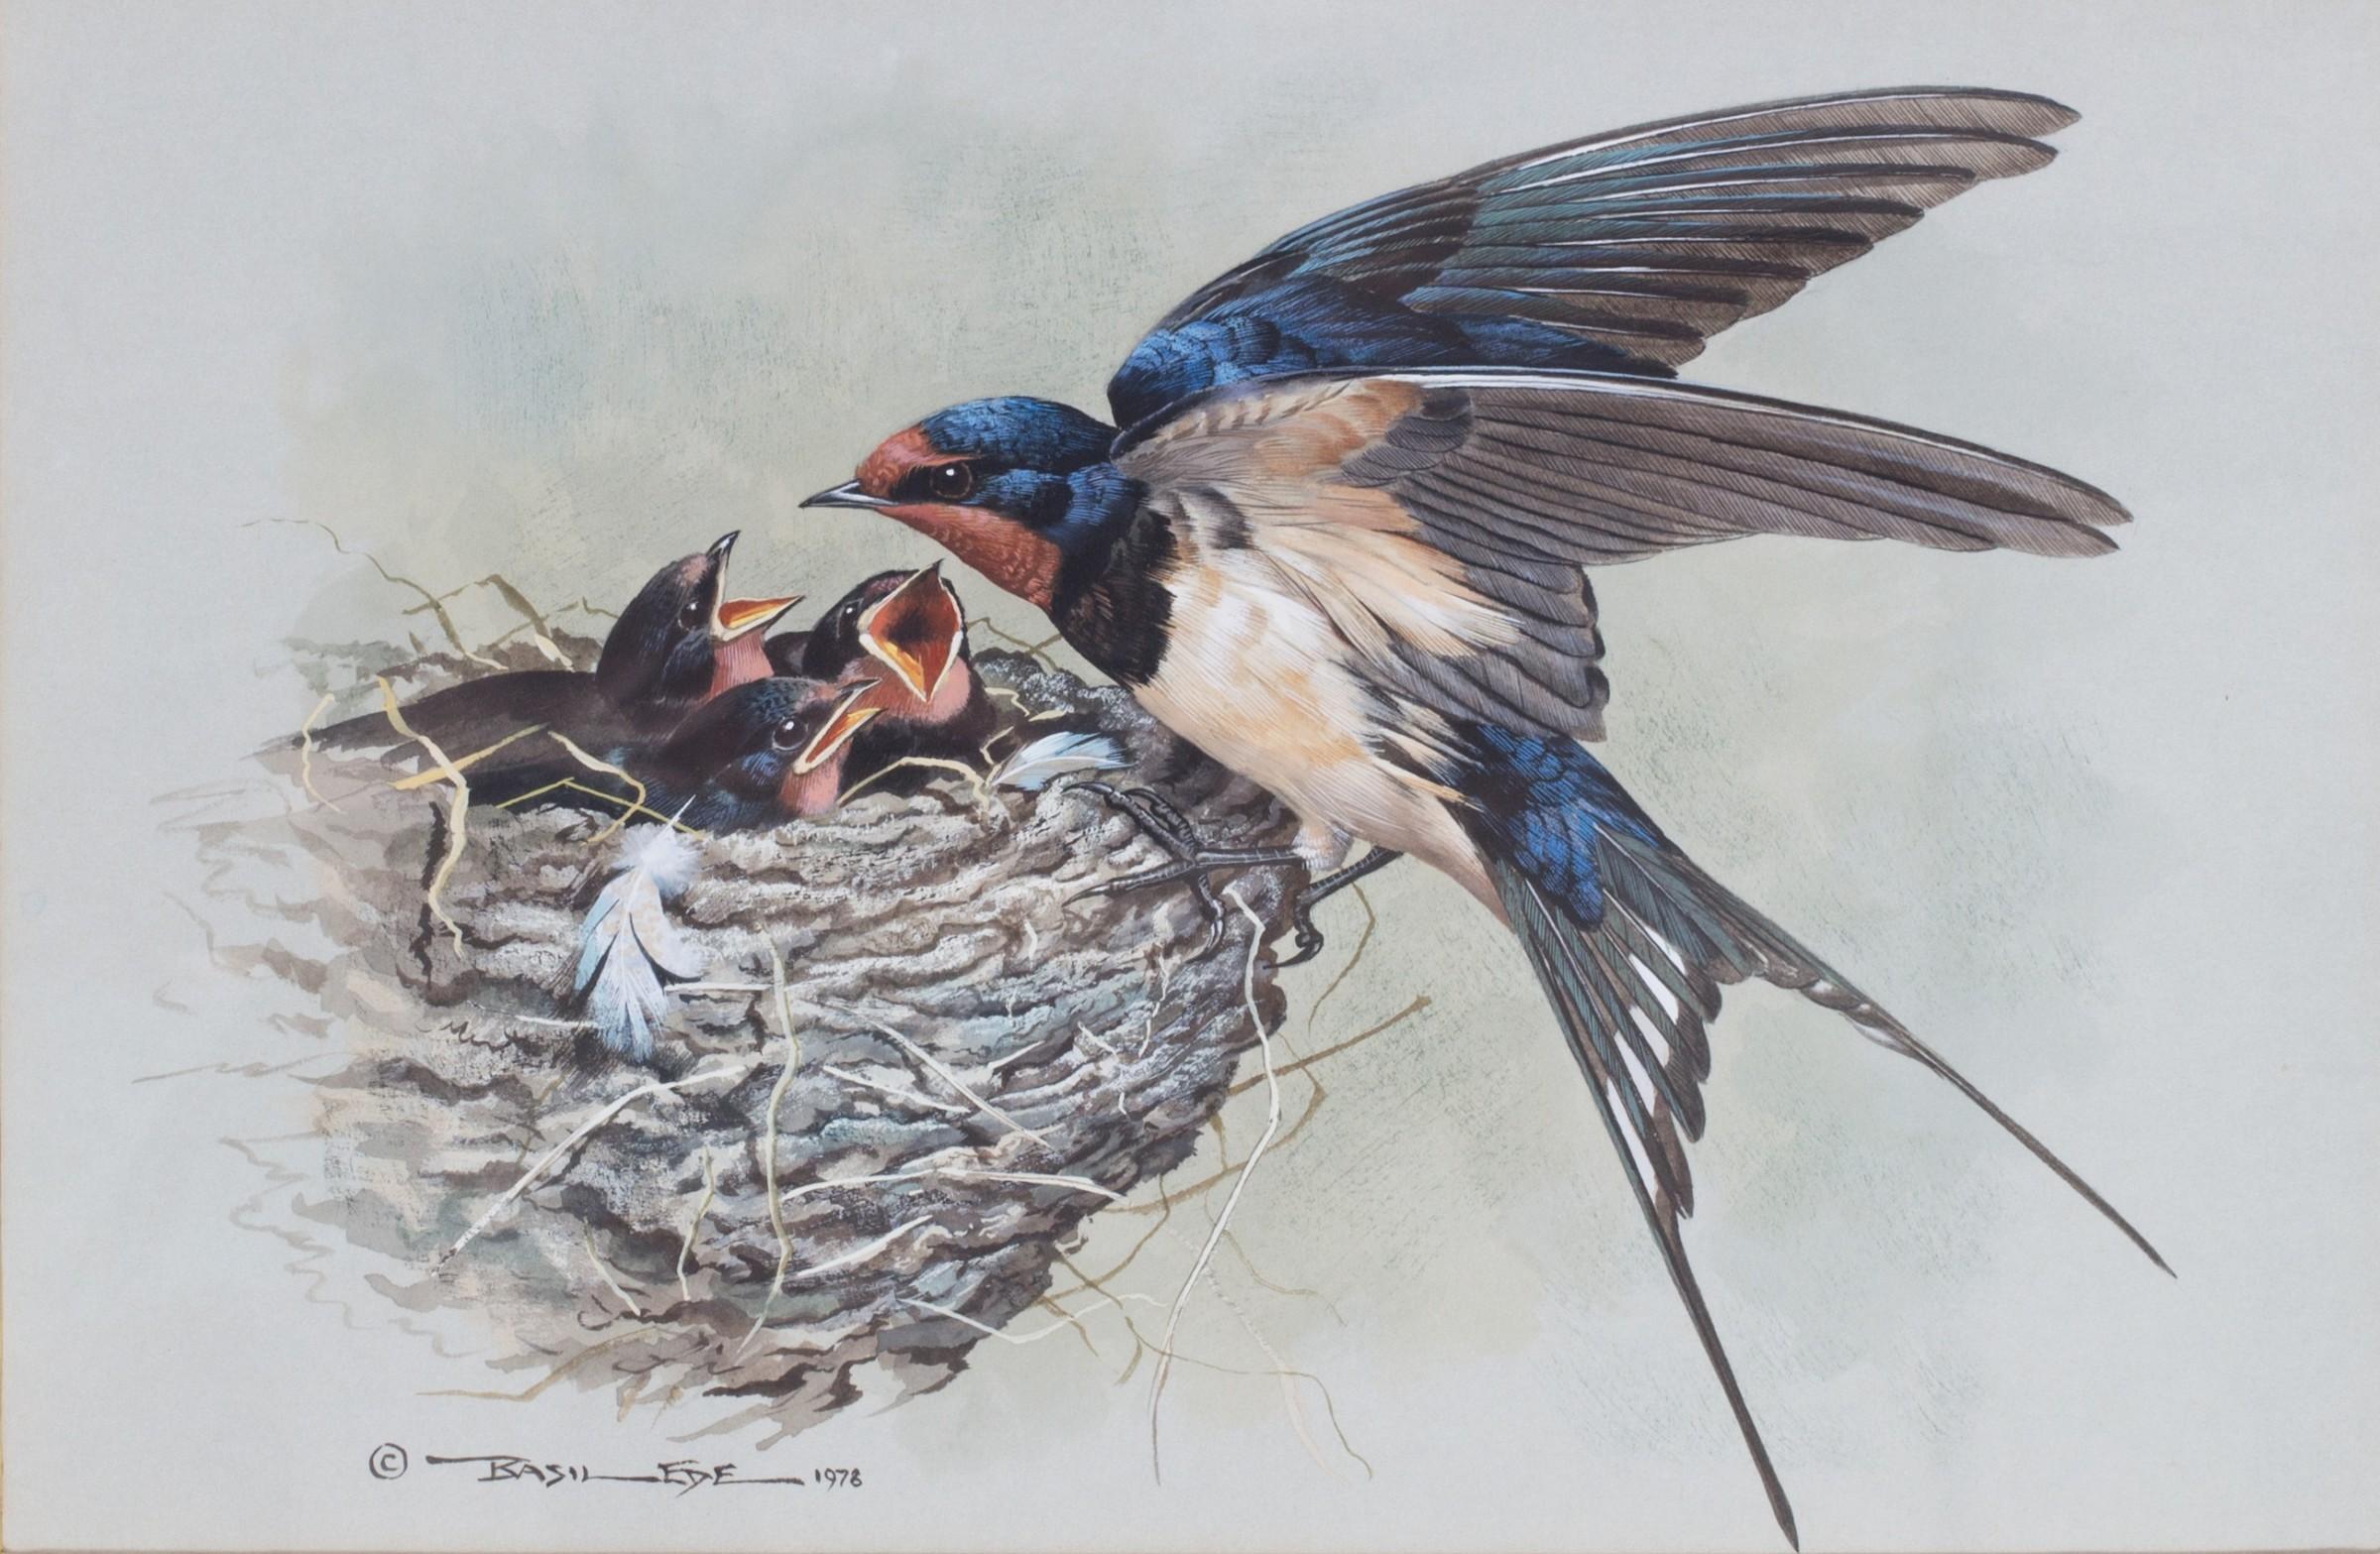 Basil Ede, Barn swallow at nest | Rountree Tryon